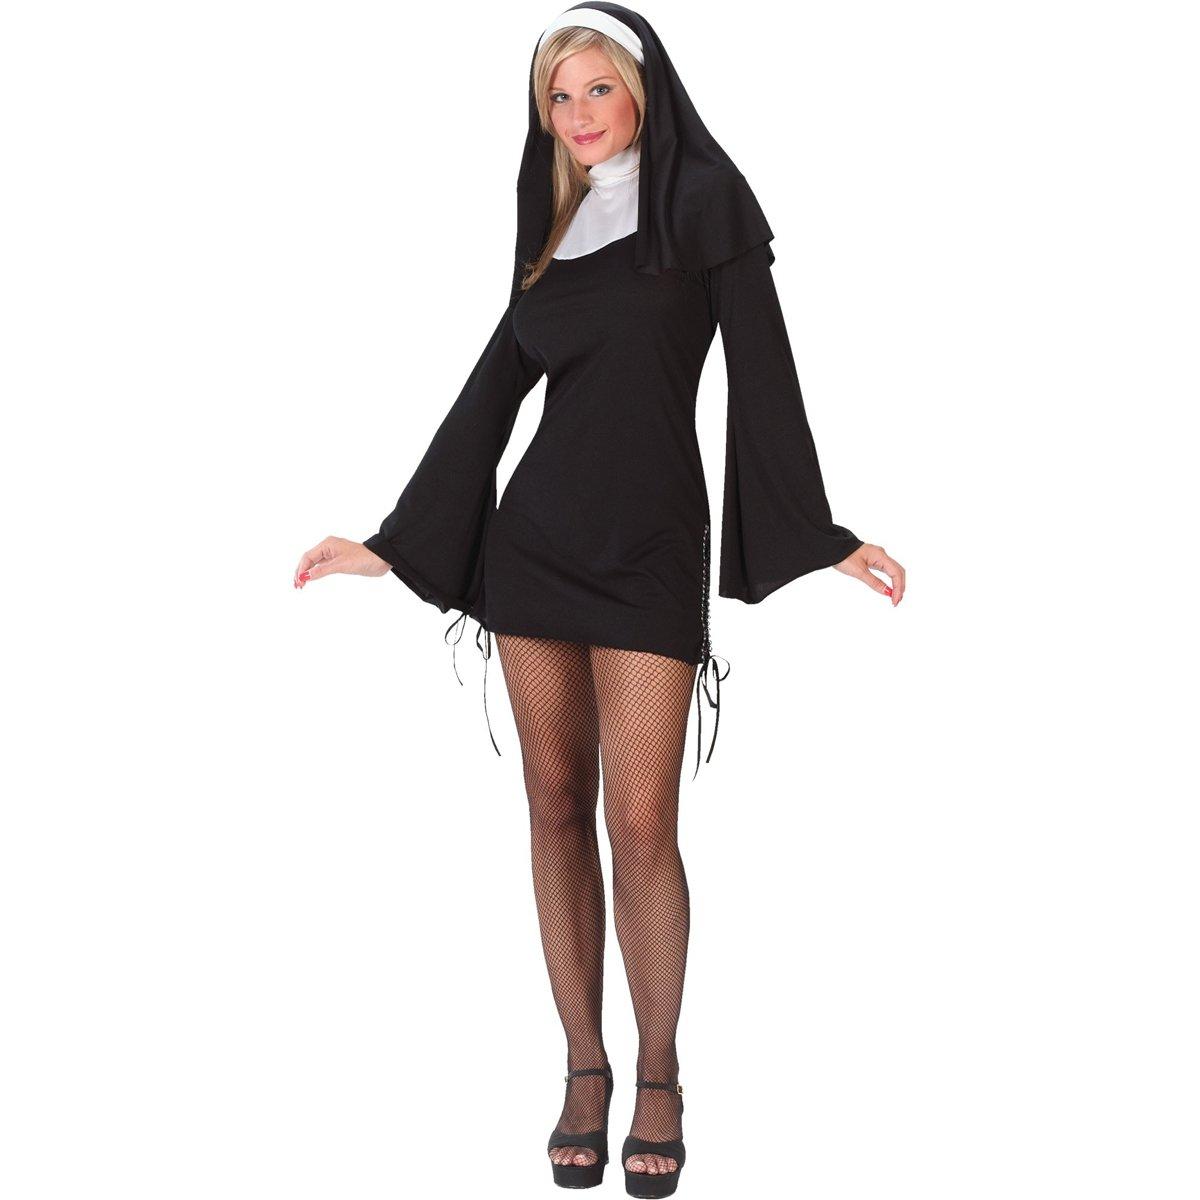 FunWorld Women's Naughty Nun, Black, M/L 10-14 Costume